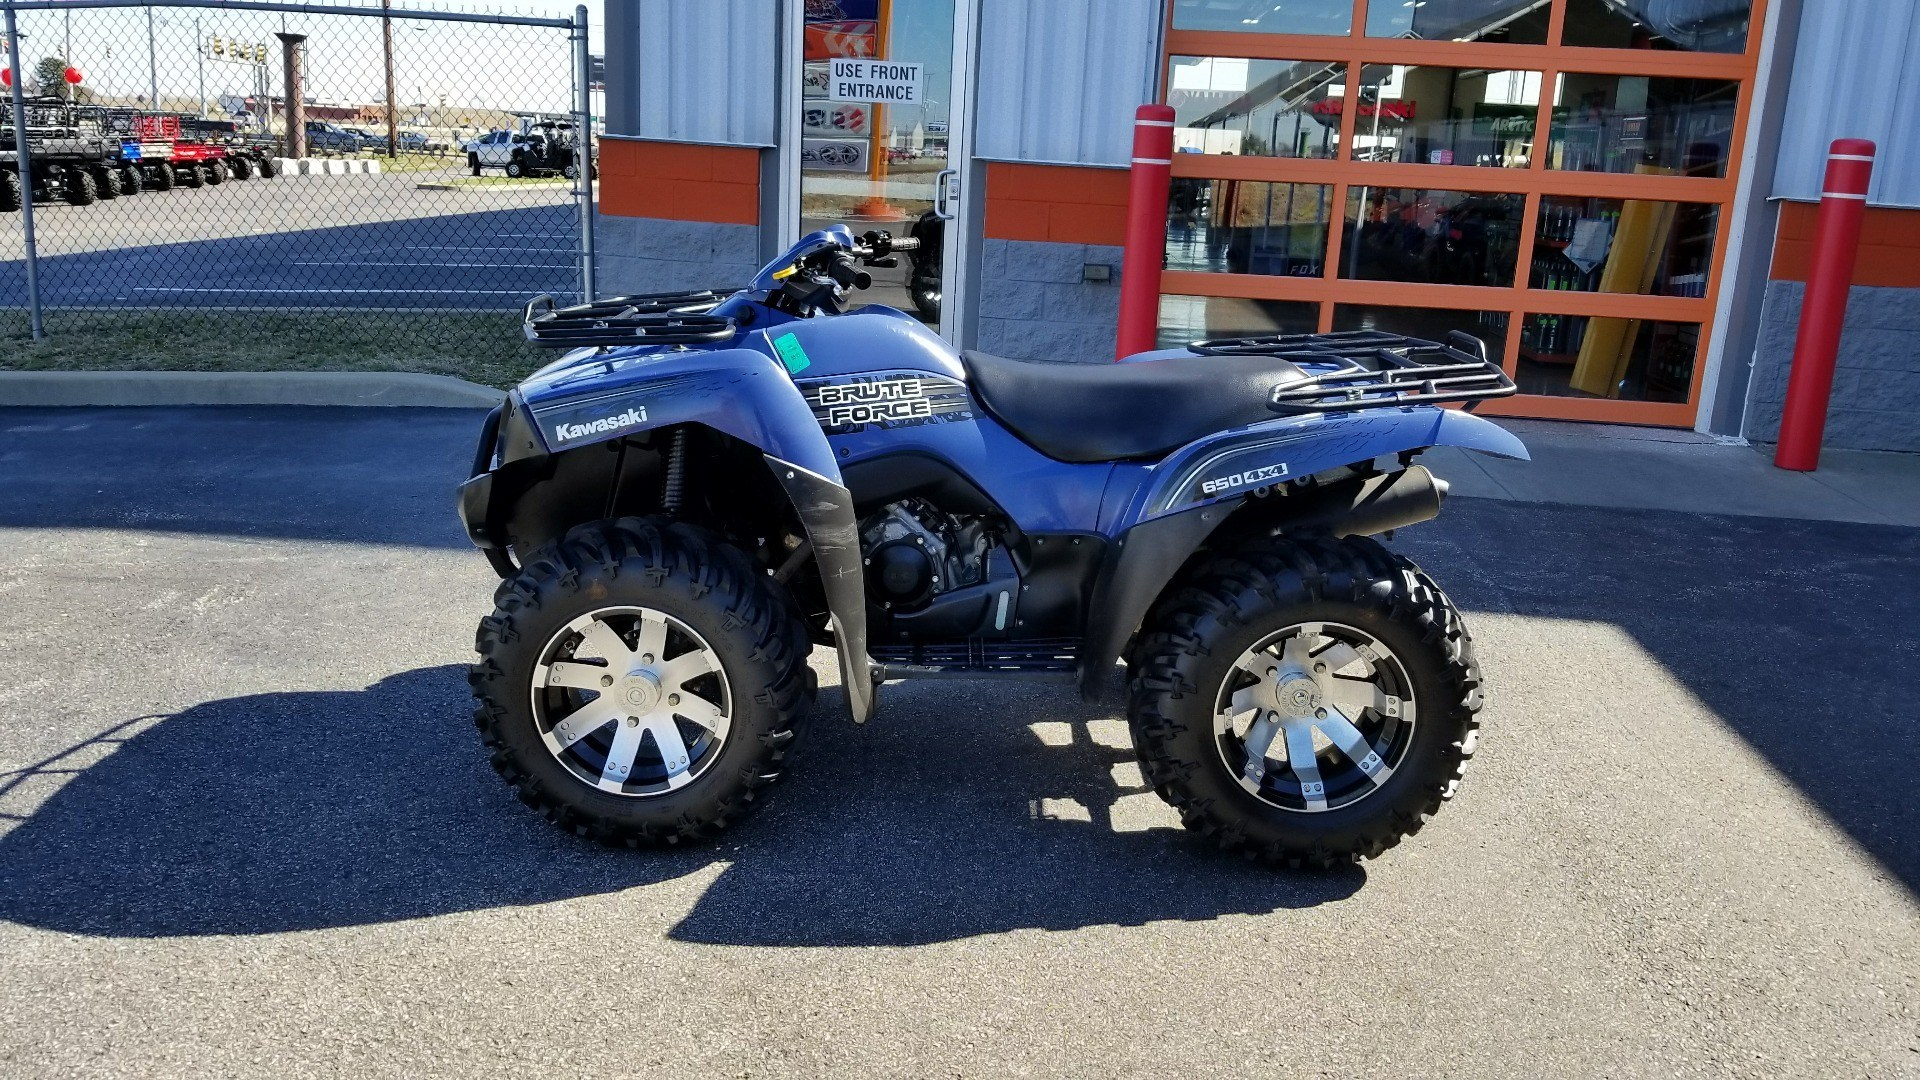 2011 Brute Force 650 4x4